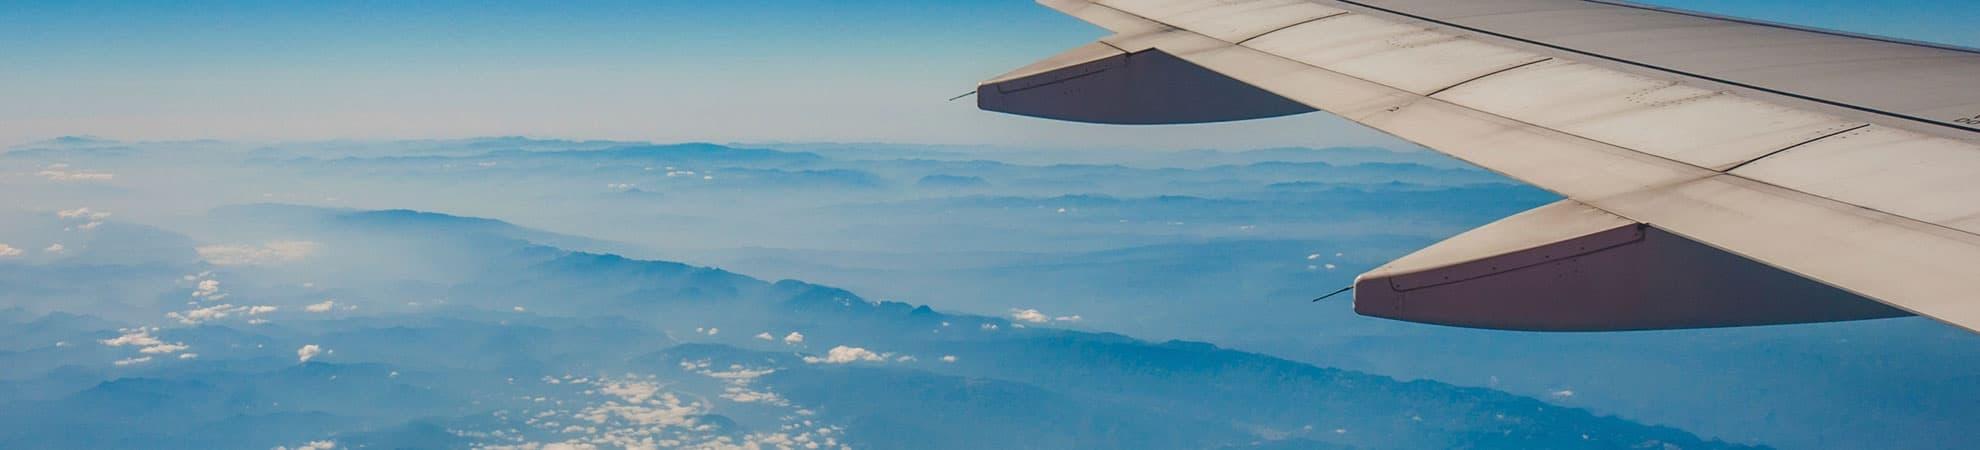 Formalités et visas en Birmanie